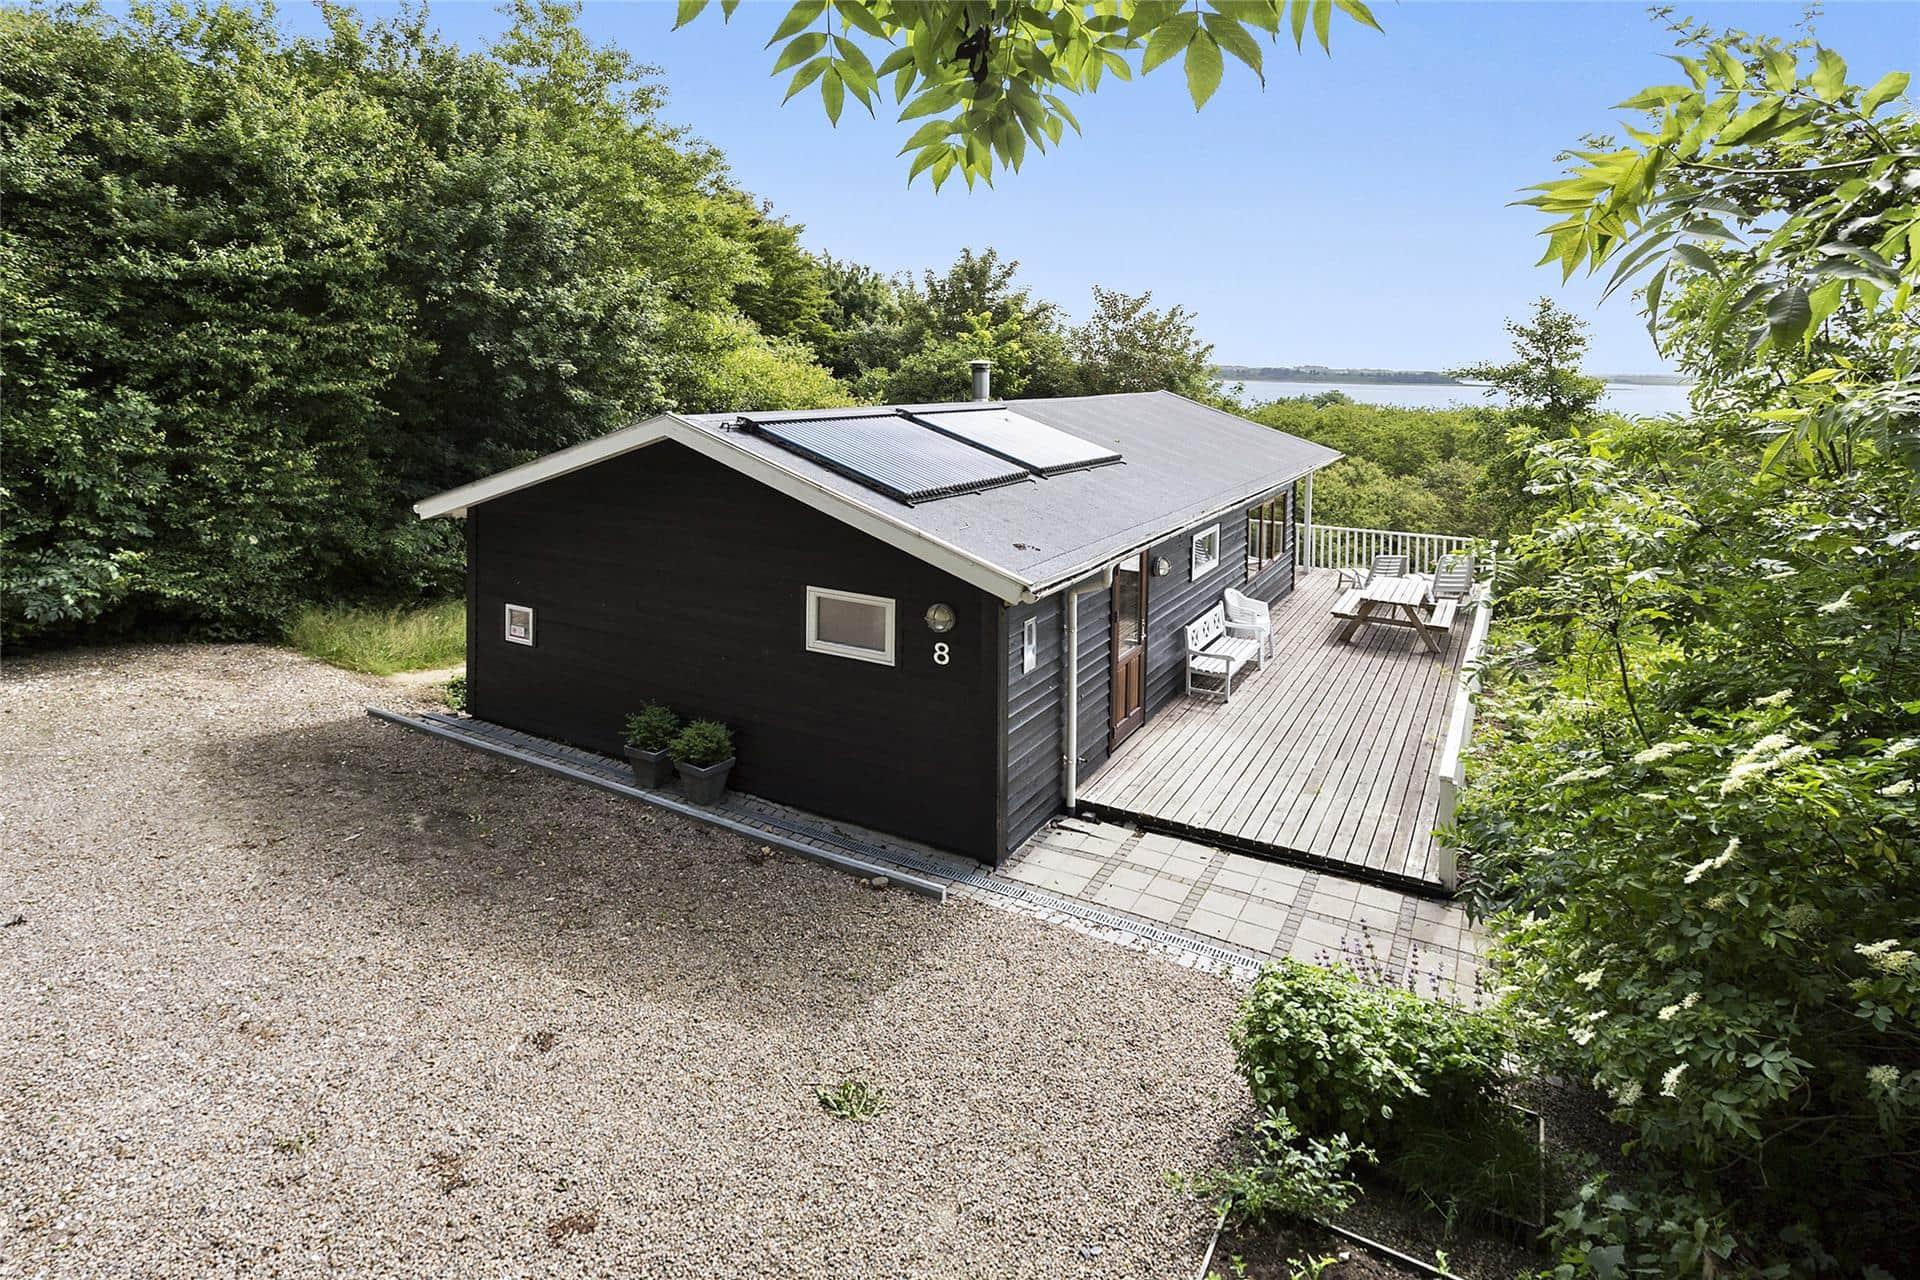 Bild 1-13 Ferienhaus 483, Bjergvej 8, DK - 7752 Snedsted